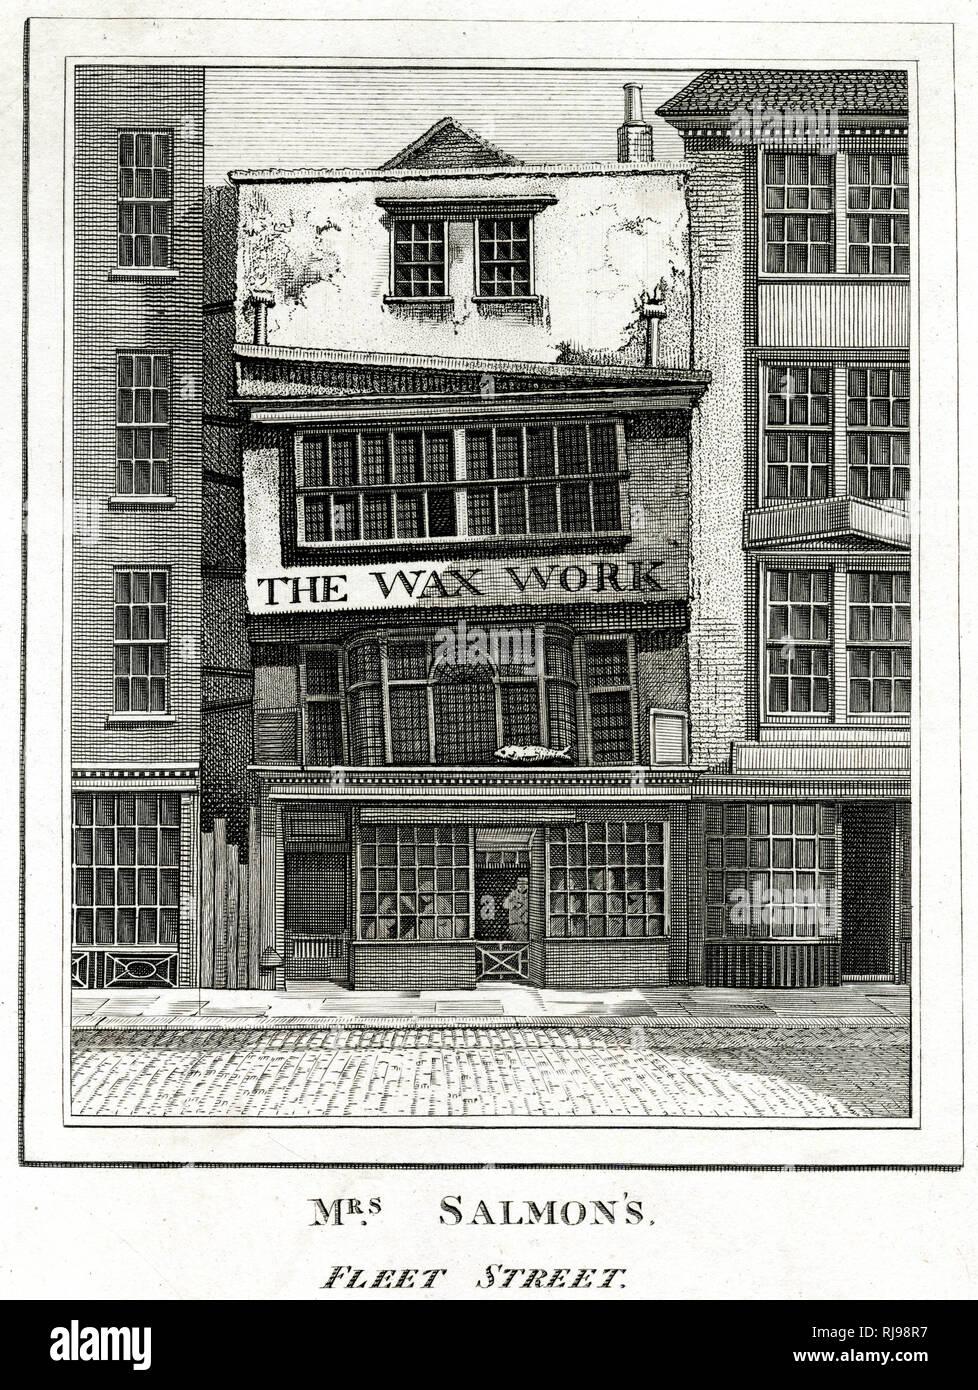 MRS SALMON'S WAXWORKS, Fleet Street, London : a favourite haunt of William Hogarth Stock Photo